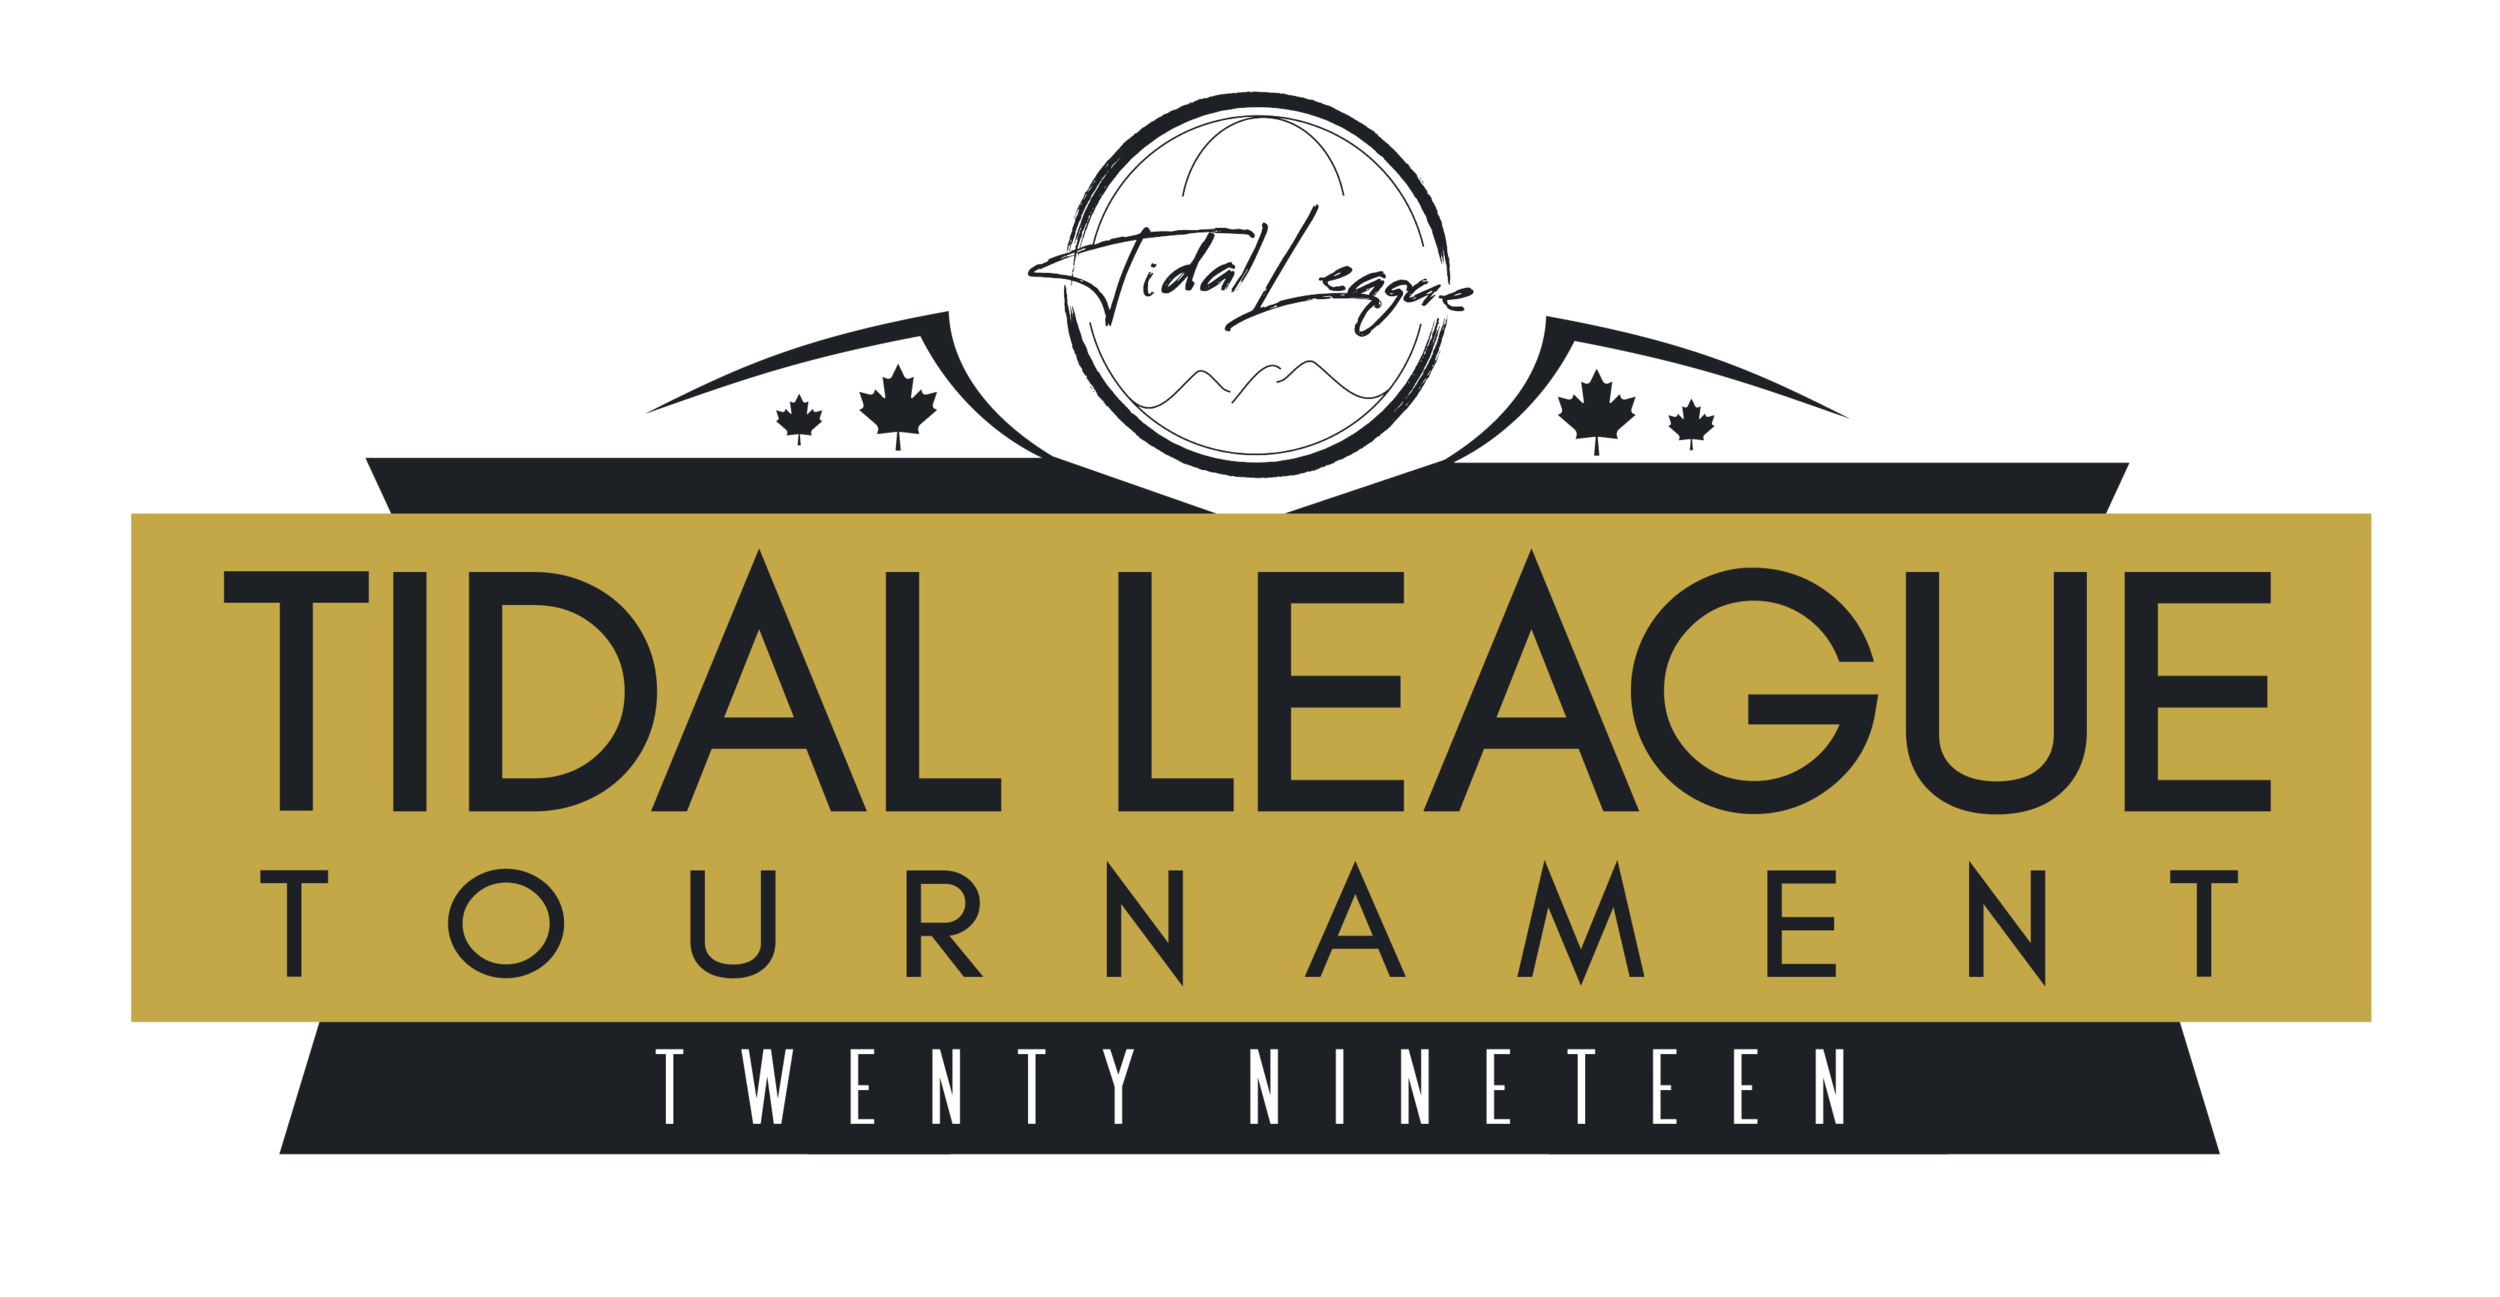 Tidal League Tournament - Official Logo DARK-01.png